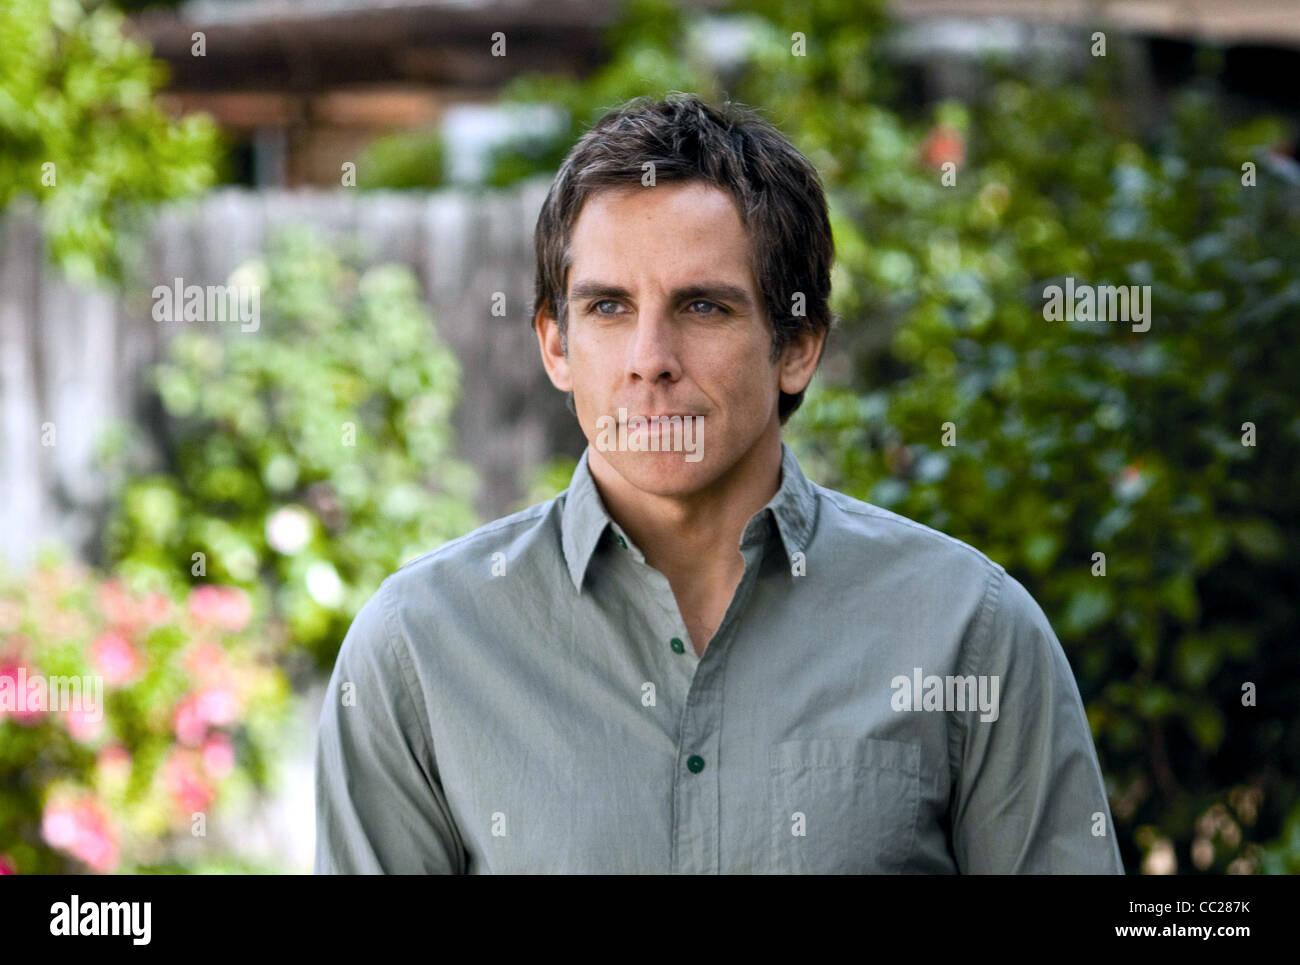 Ben Stiller Little Fockers 2010 Stock Photo Alamy